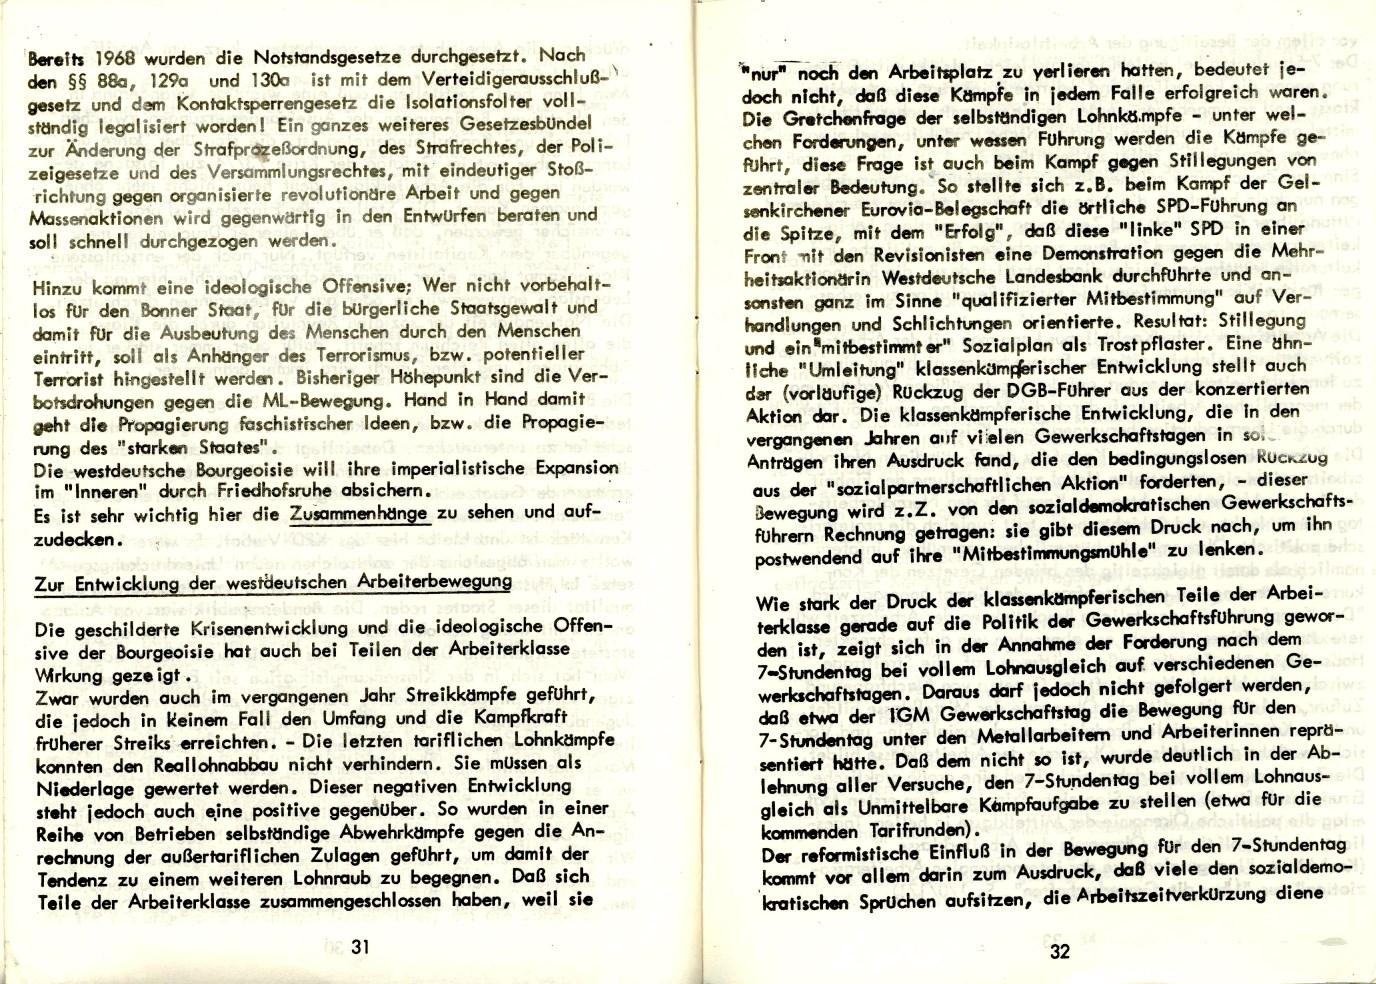 KGBE_1978_Resolutionen_17